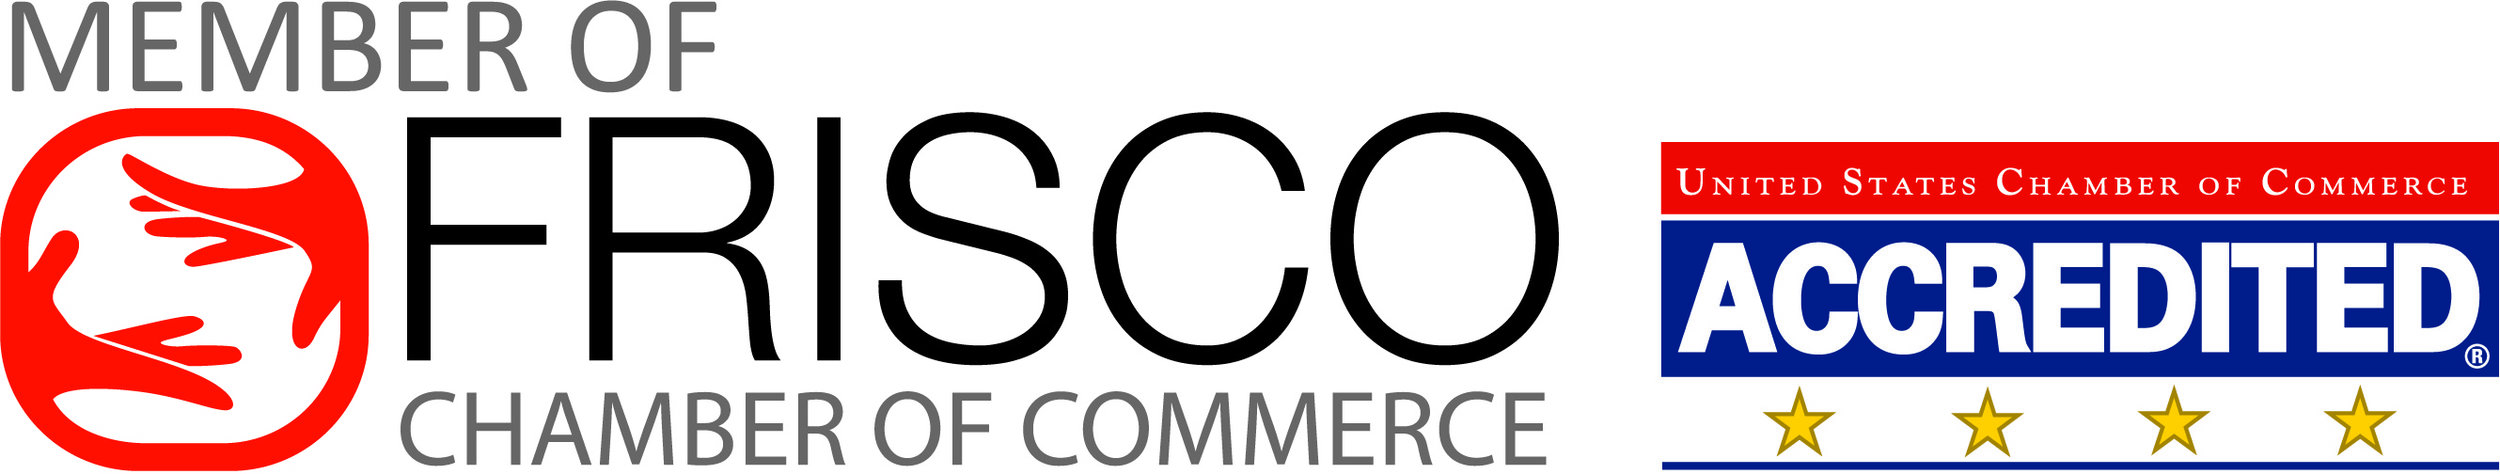 FriscoTXCOC_18872_2019MemberOfFrisco Chamber Logo 4-Star.jpg